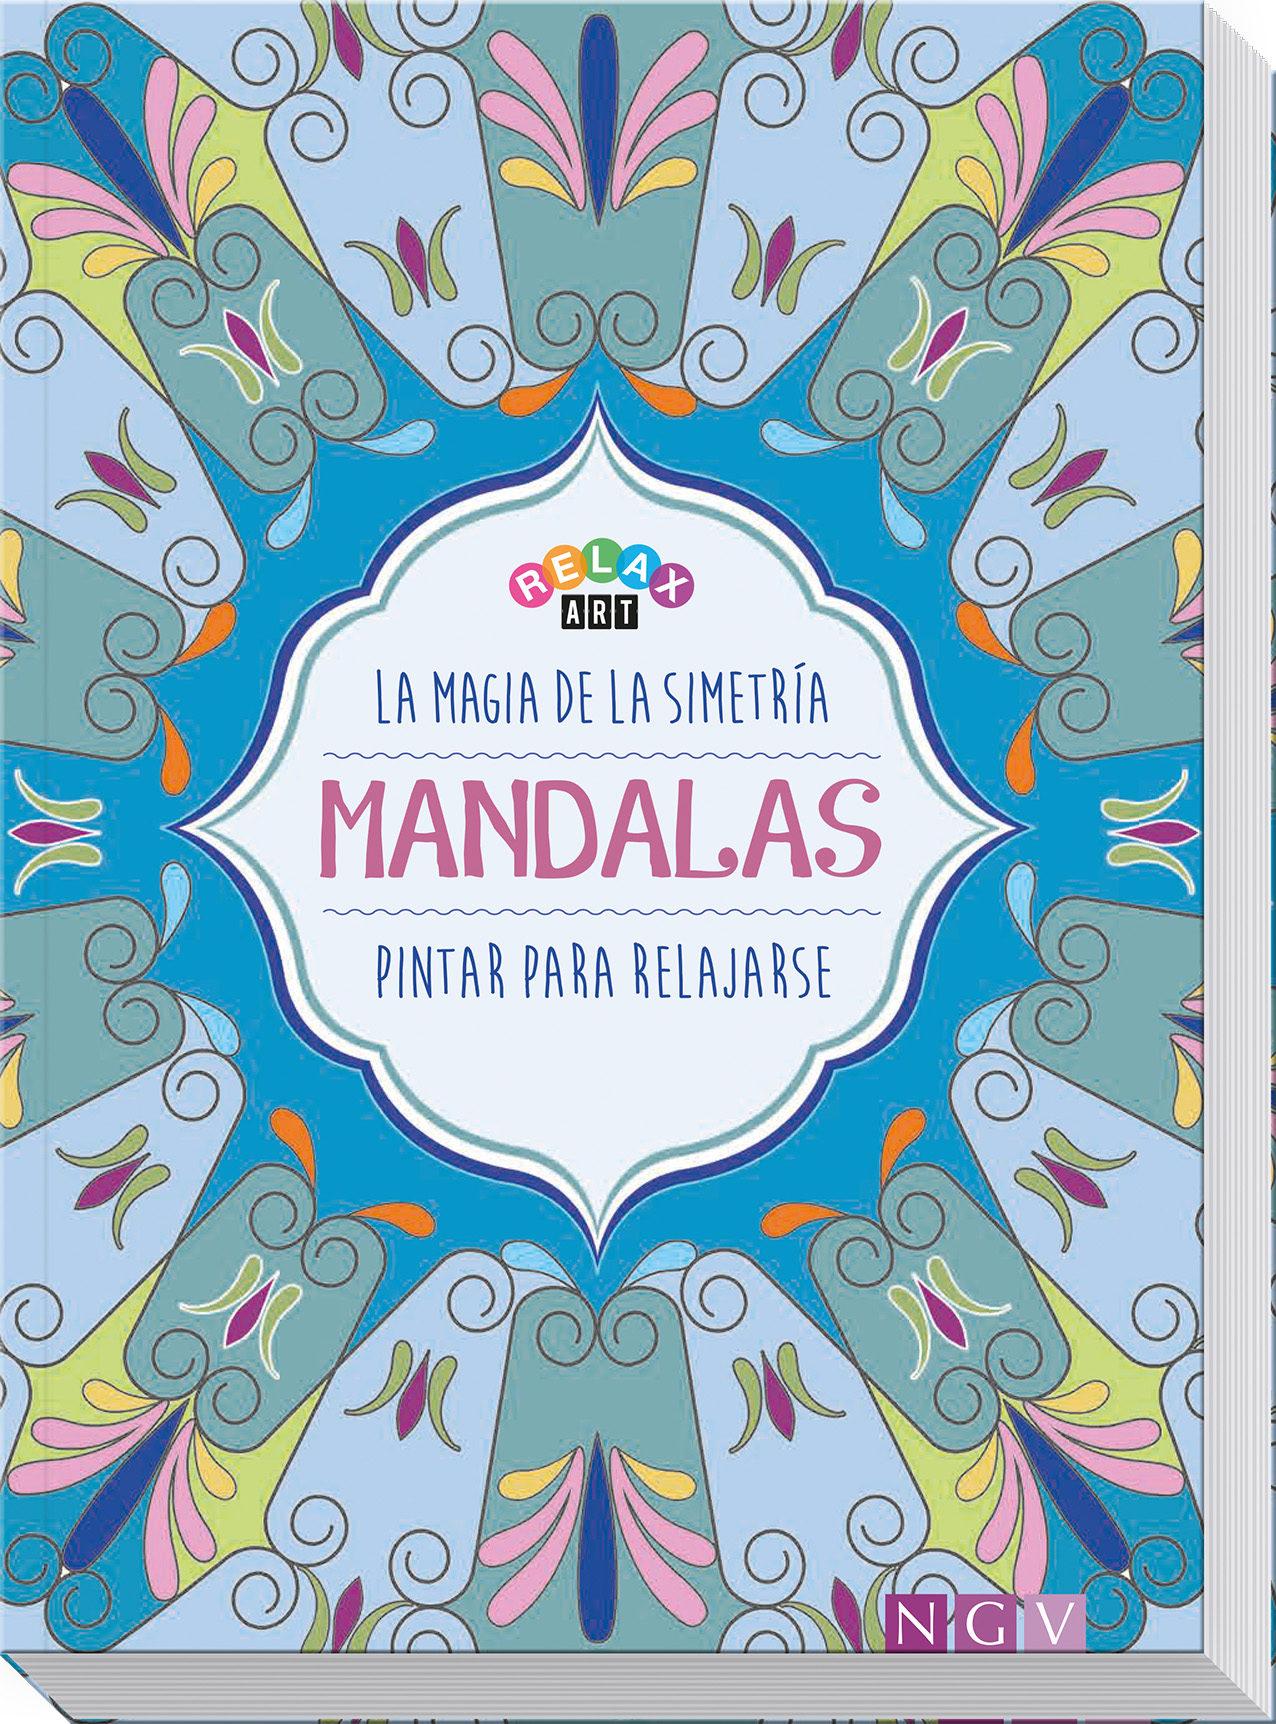 MANDALAS (PINTAR PARA RELAJARSE) | VV.AA. | Comprar libro 9783869416069